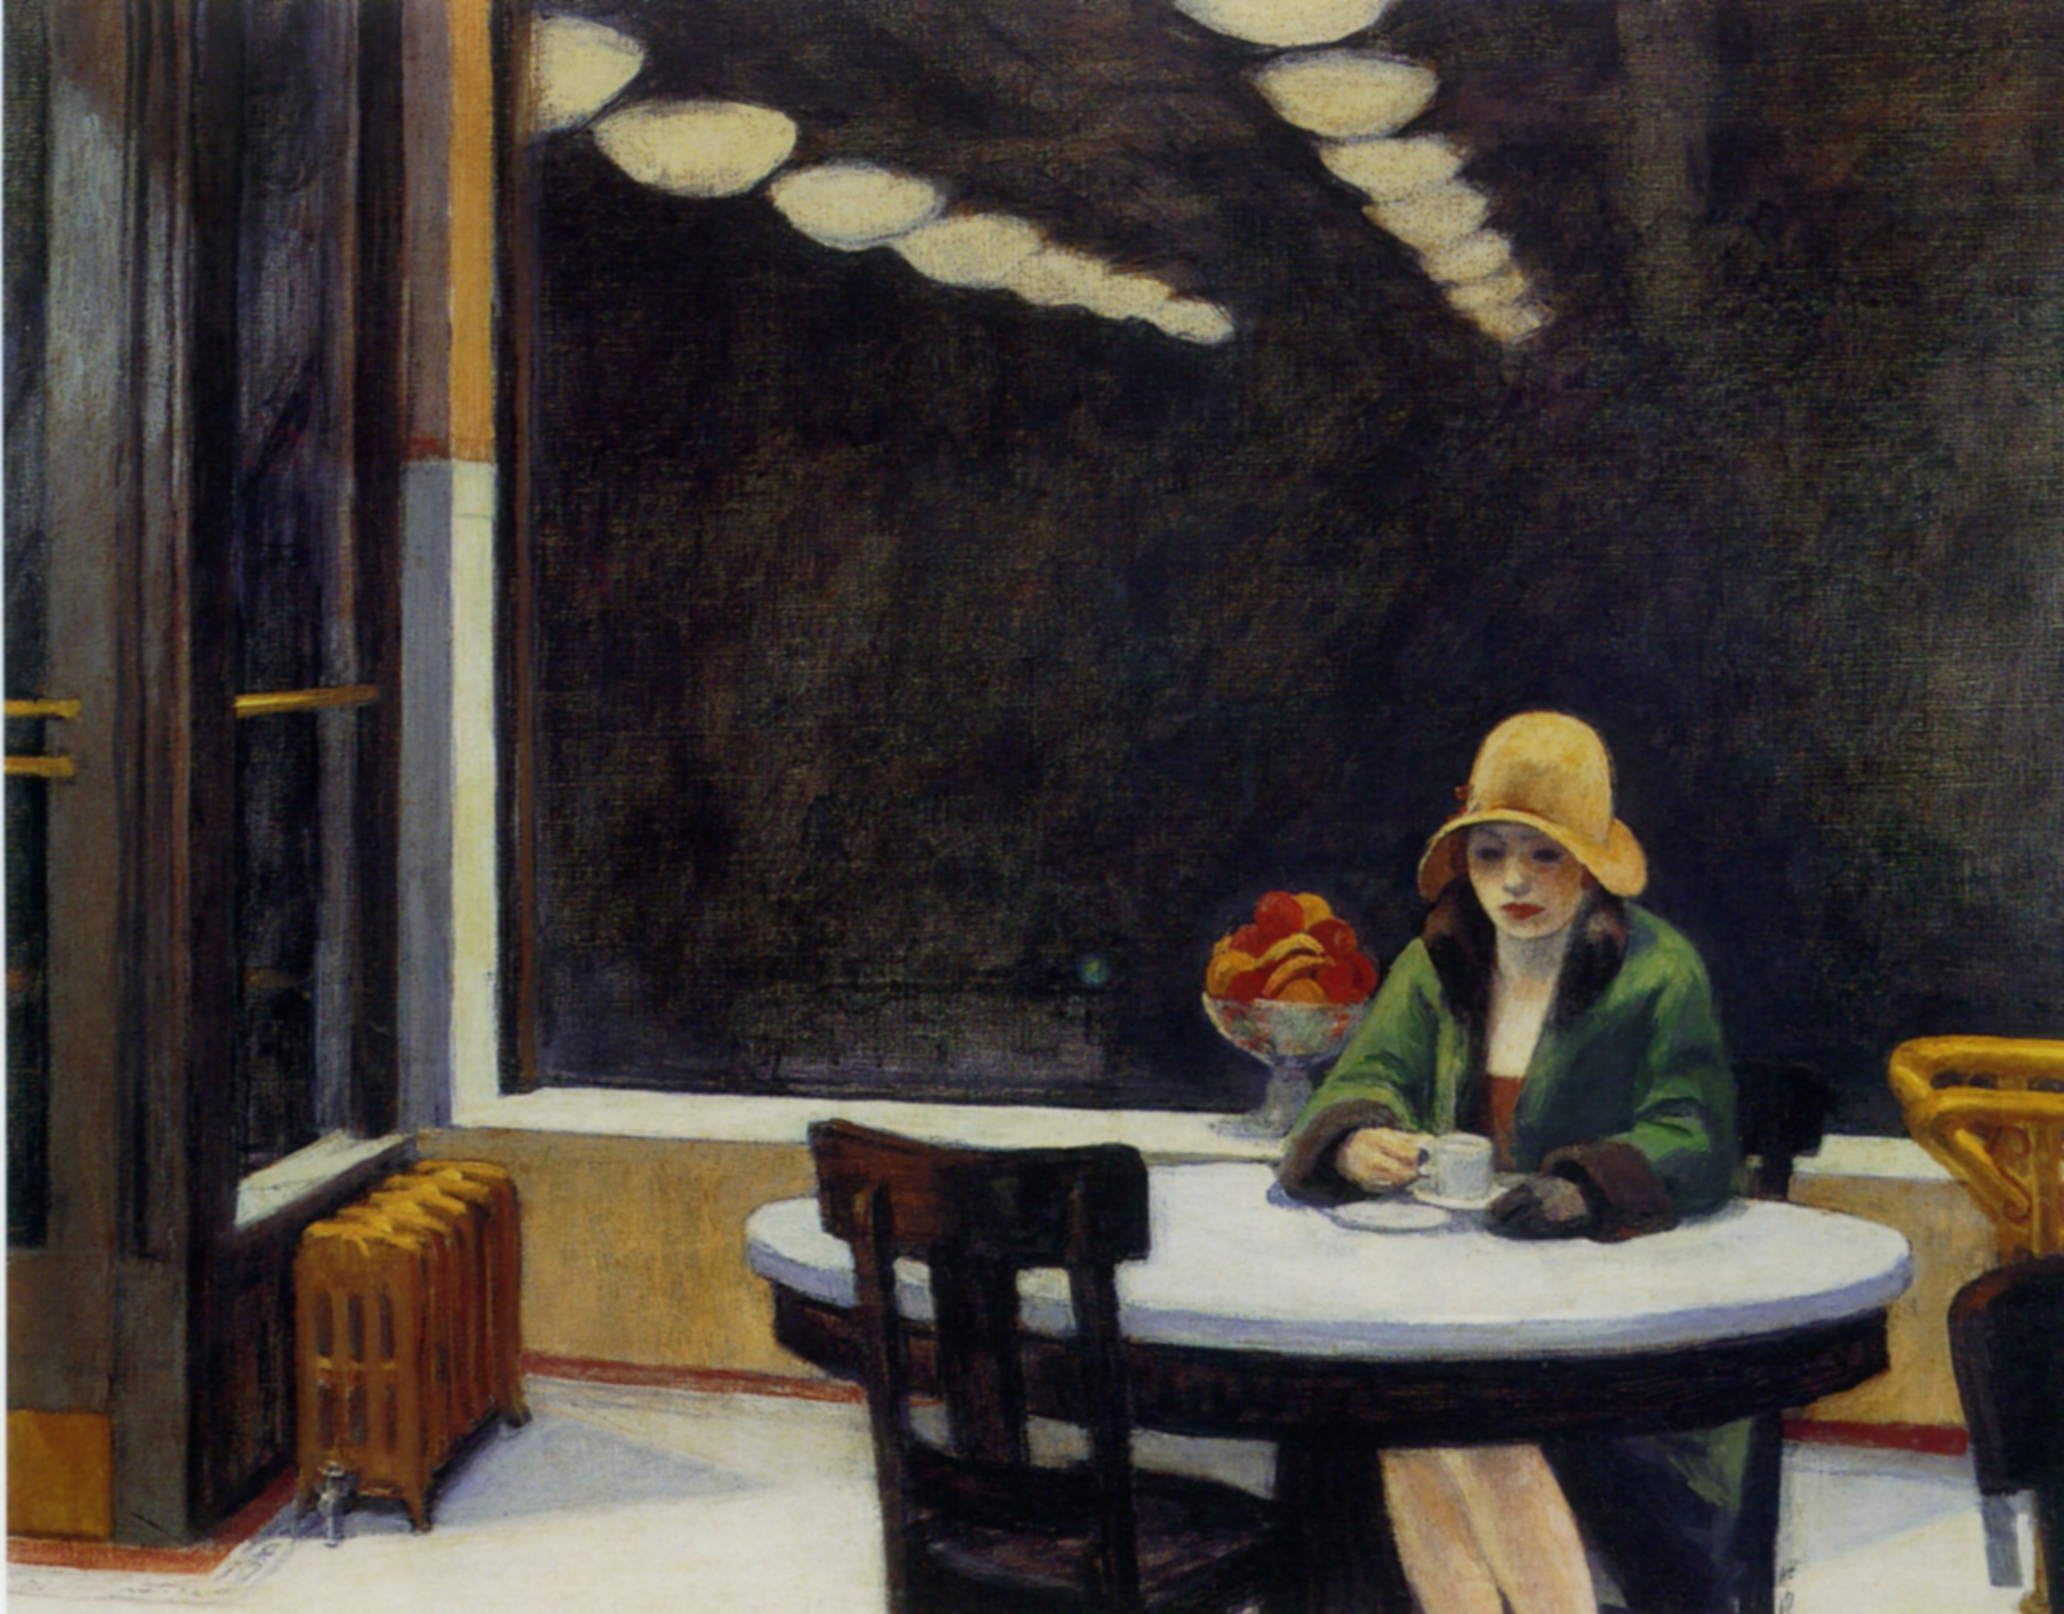 Automat, 1927 by Edward Hopper